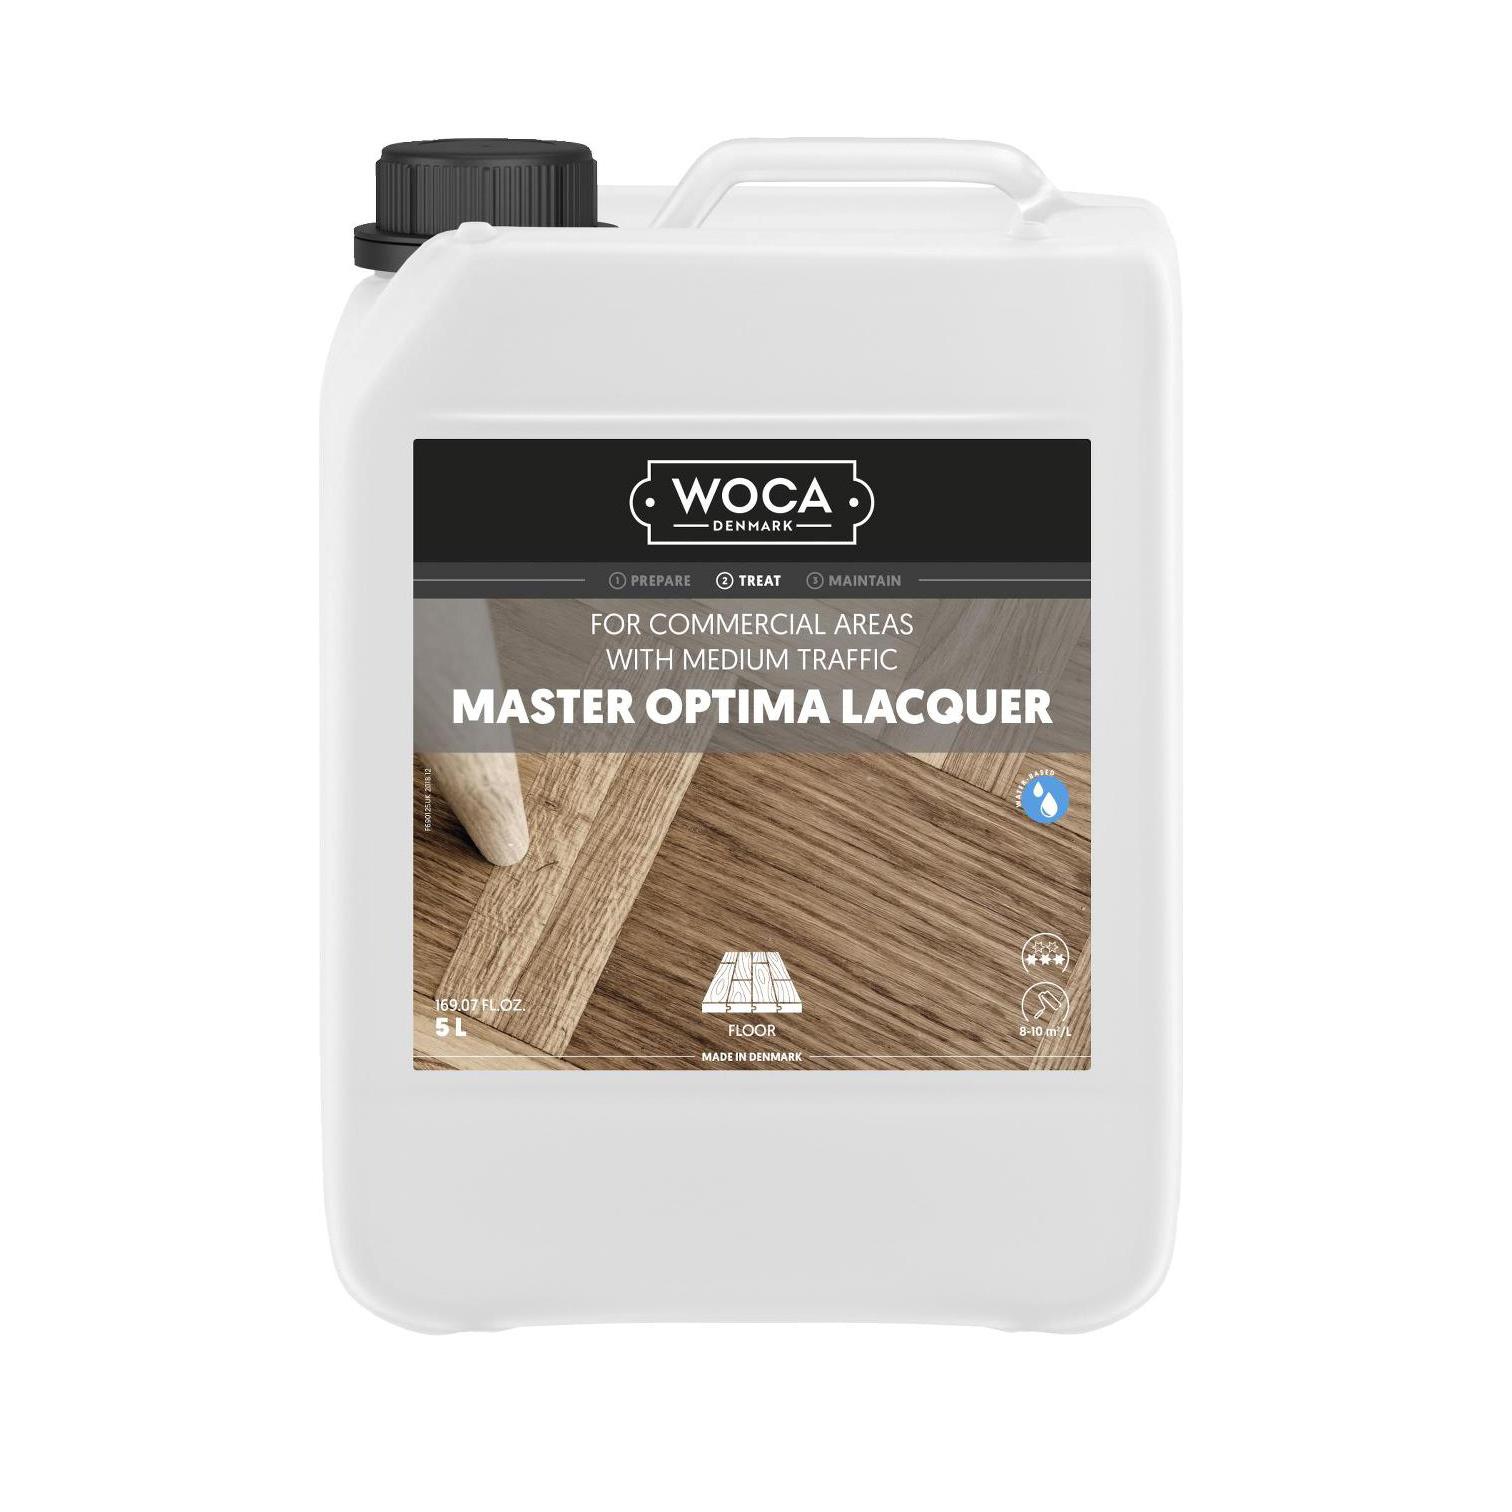 WOCA Master Optima 5 Ltr. Glänzend